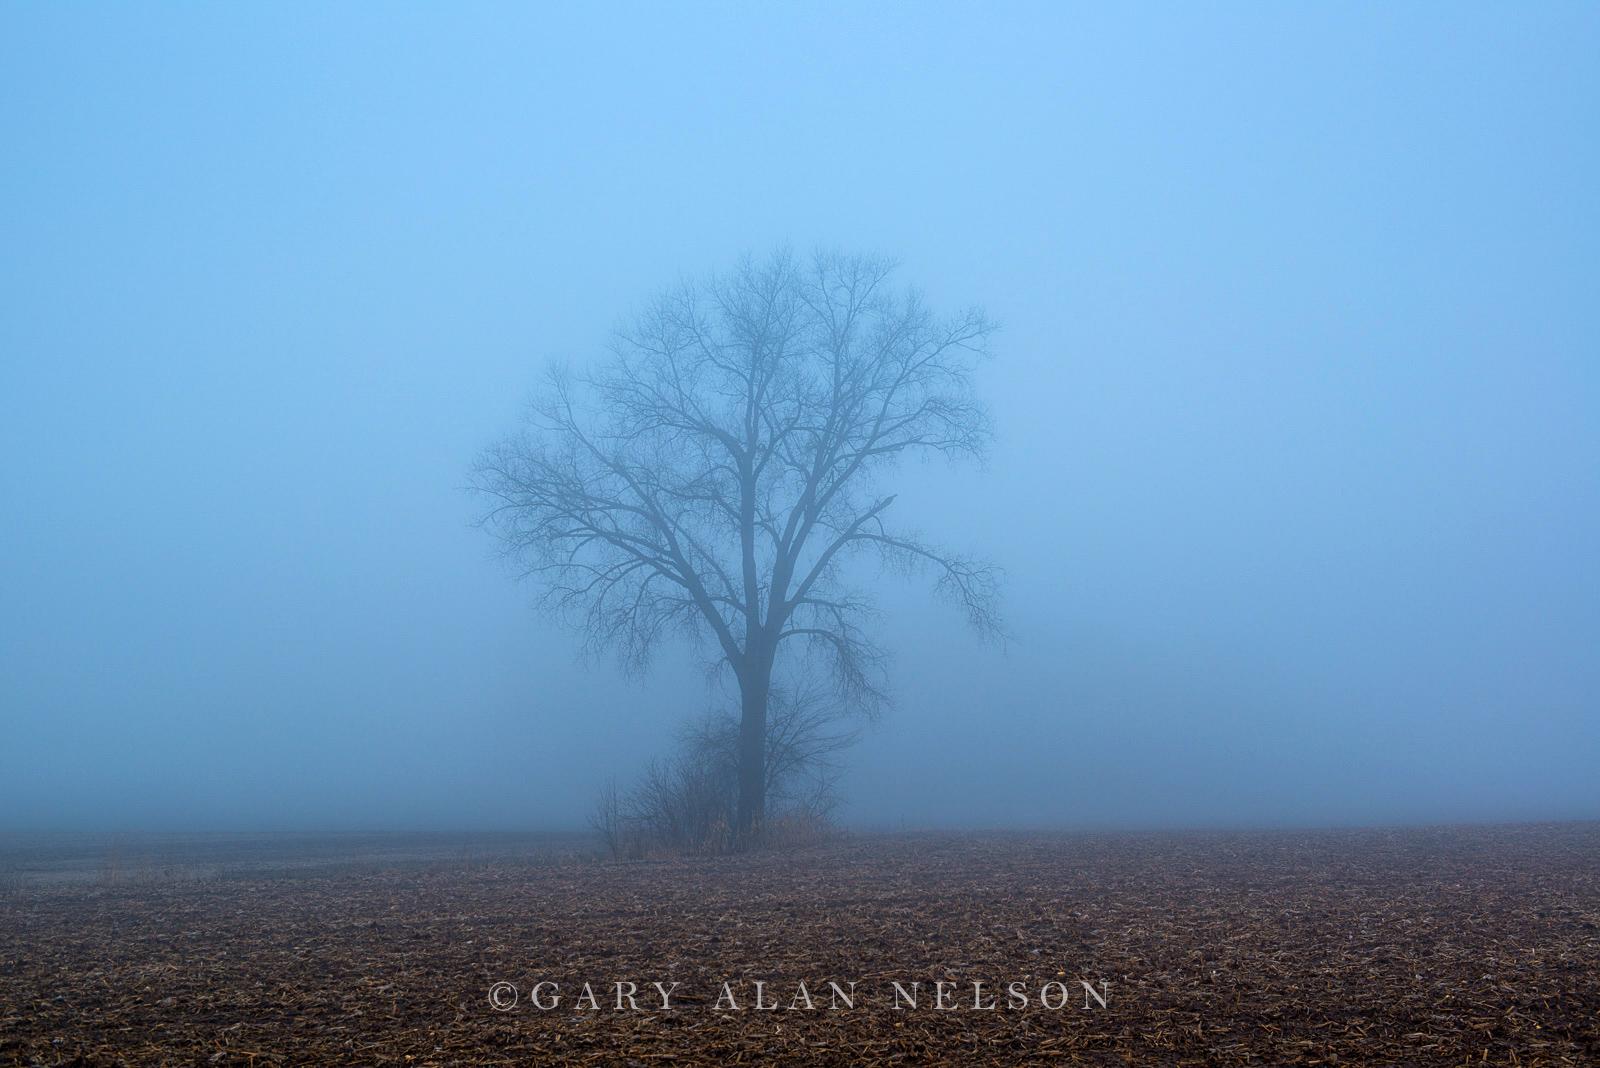 Oak outstanding in fog, Chisago County, Minnesota